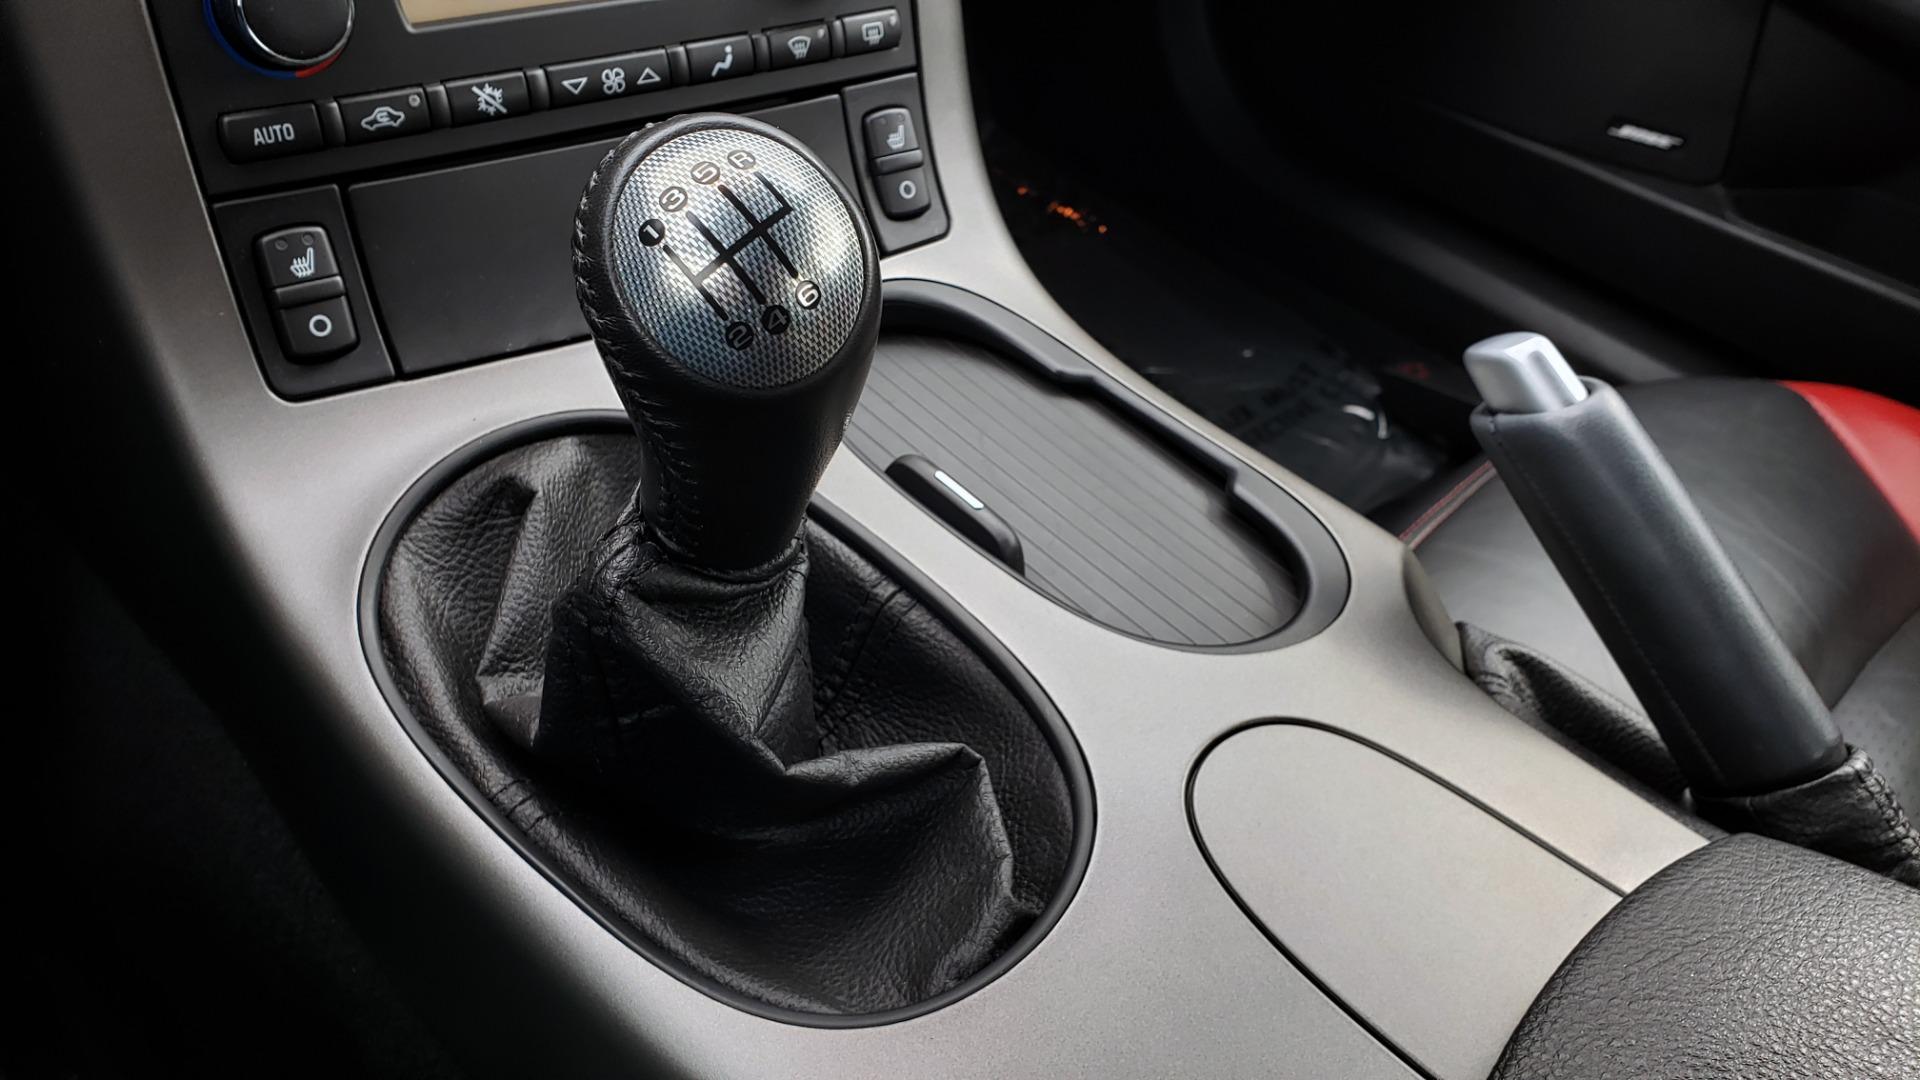 Used 2007 Chevrolet CORVETTE Z06 2LZ / 7.0L 427 V8 / 6-SPD MAN / BOSE / POLISHED WHEELS for sale Sold at Formula Imports in Charlotte NC 28227 69